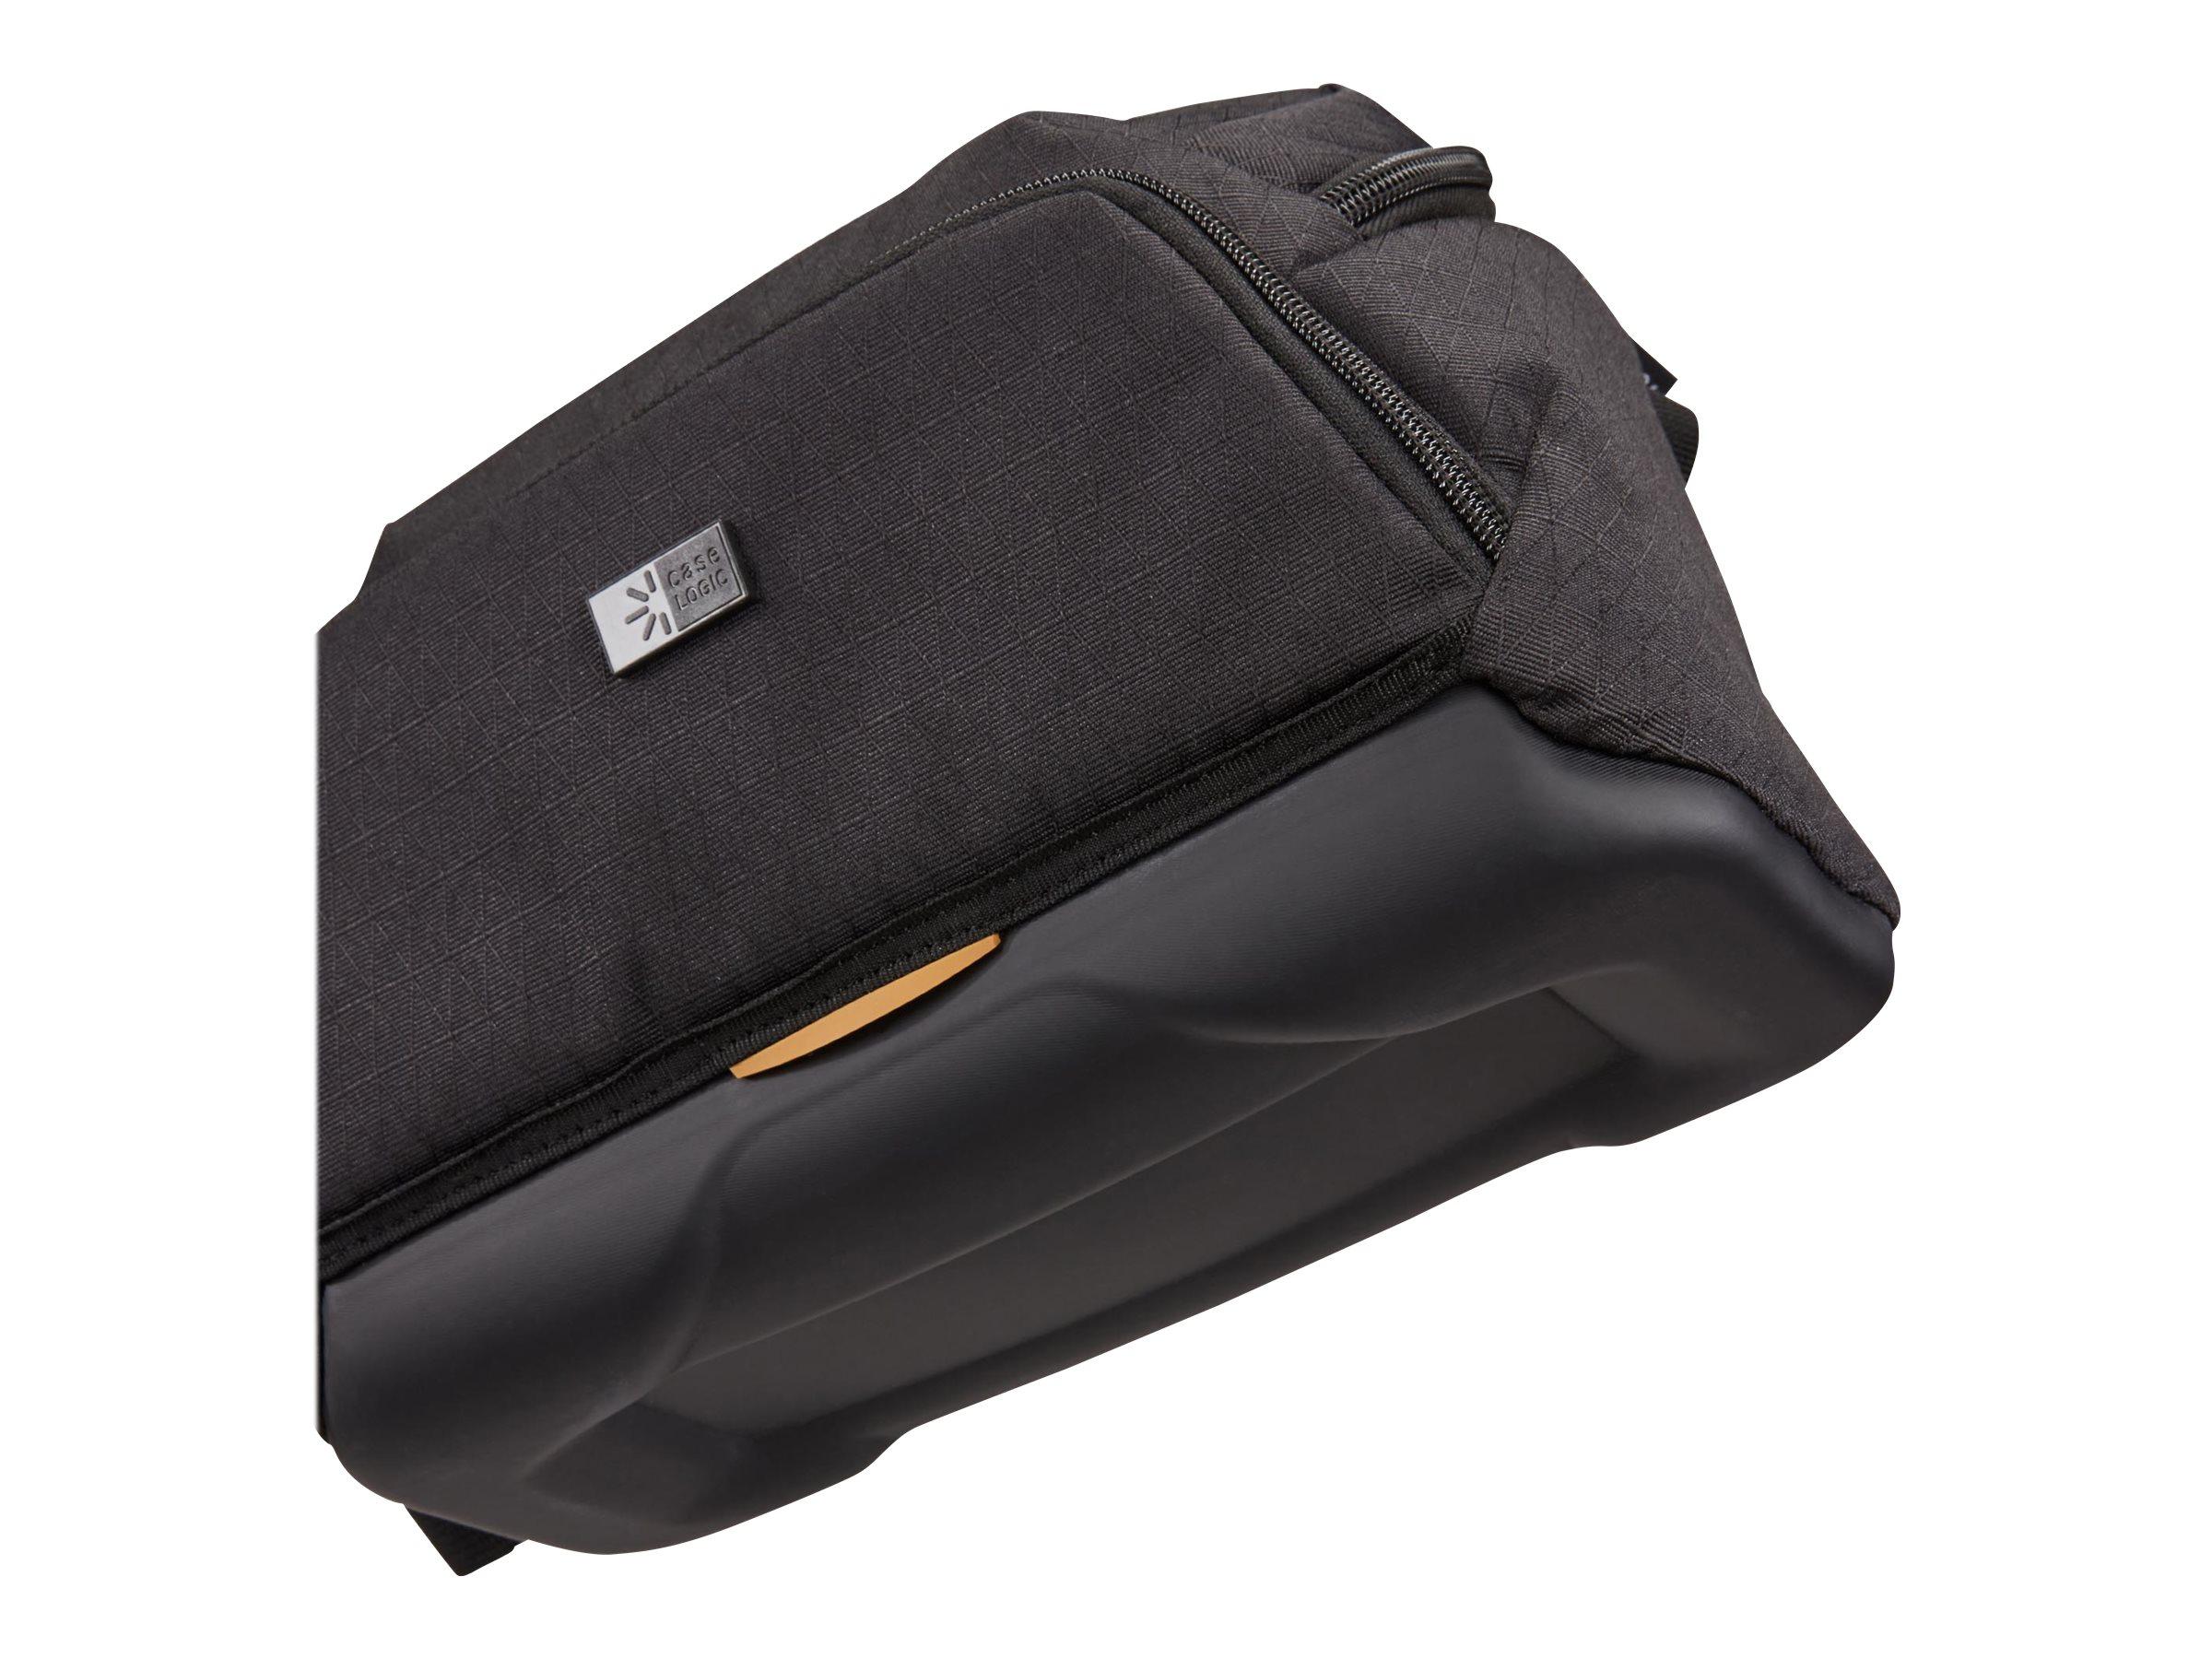 Case Logic Viso Small Camera Bag CVCS-102 - Schultertasche für DSLR-Kamera - Polyester, Ethylen-Vinylacetat (EVA) - Schwarz